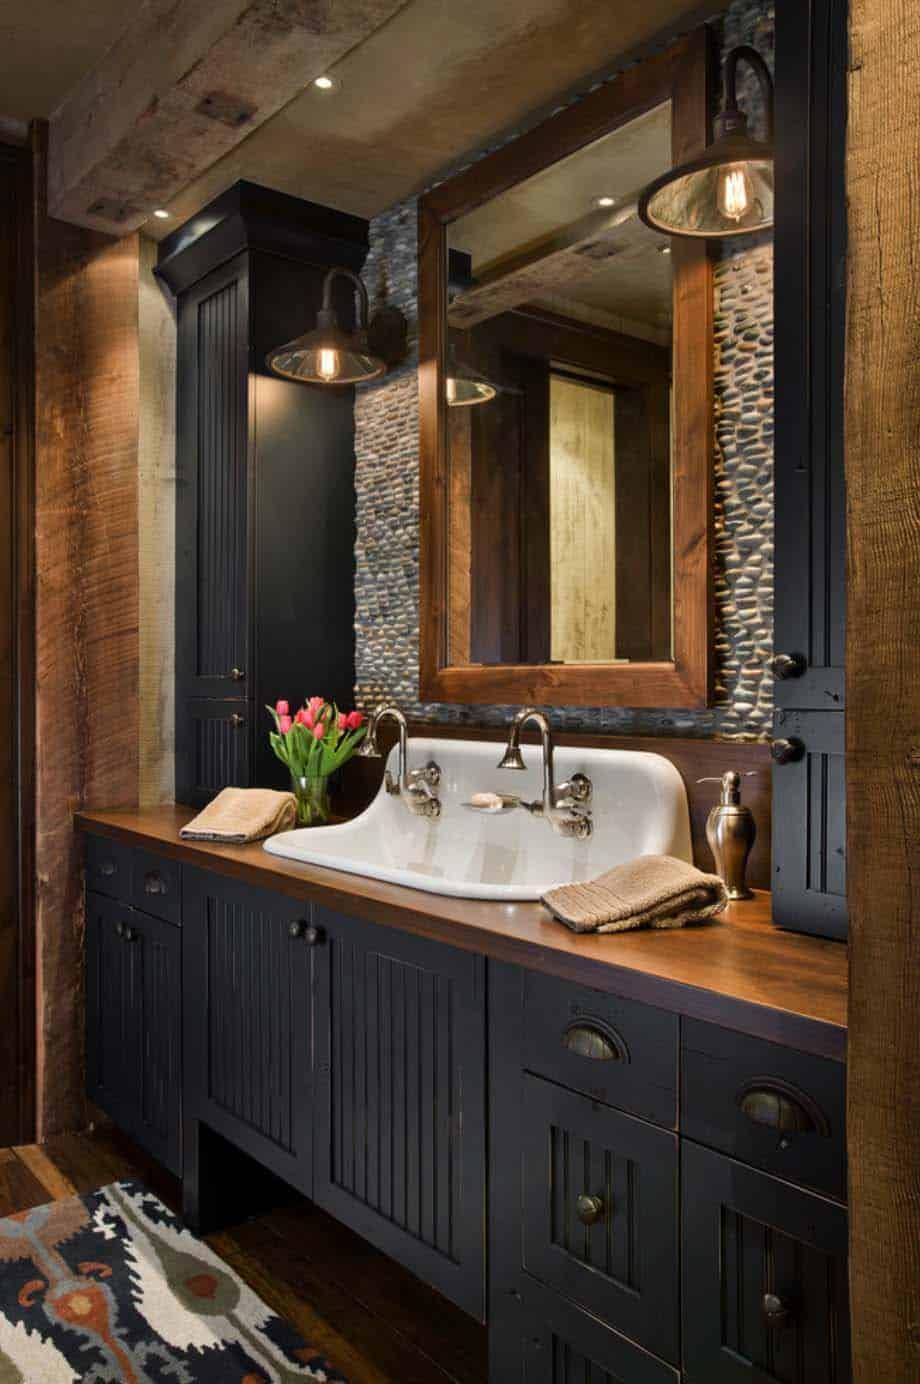 rustic bathroom vanities Farmhouse Vanity in Classic Black